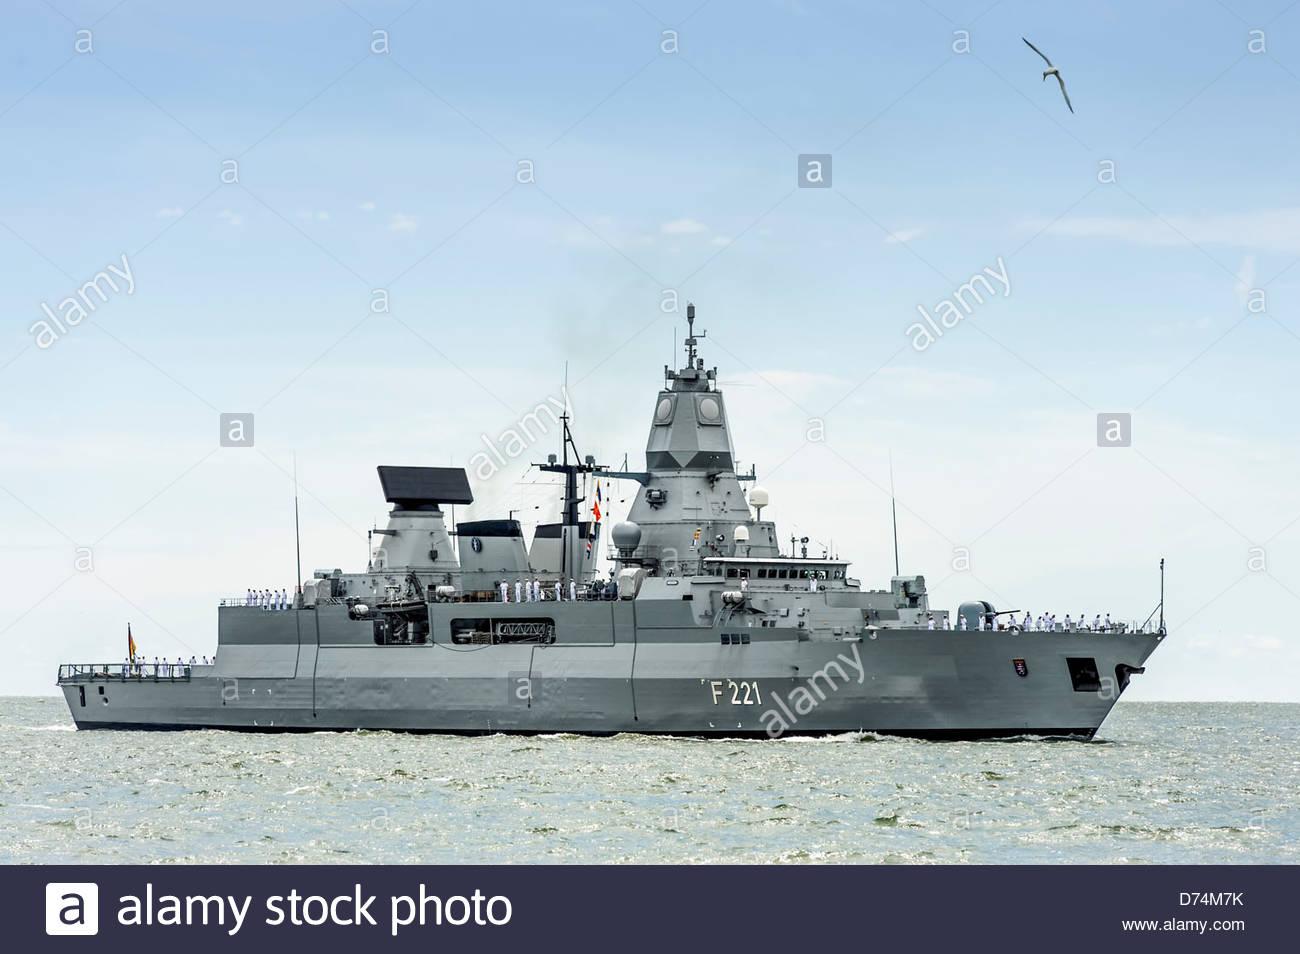 469 ft, German Frigate FGS Hessen arriving in Hampton Roads Harbor for OpSail 2012 on June 6, 2012 - Stock Image